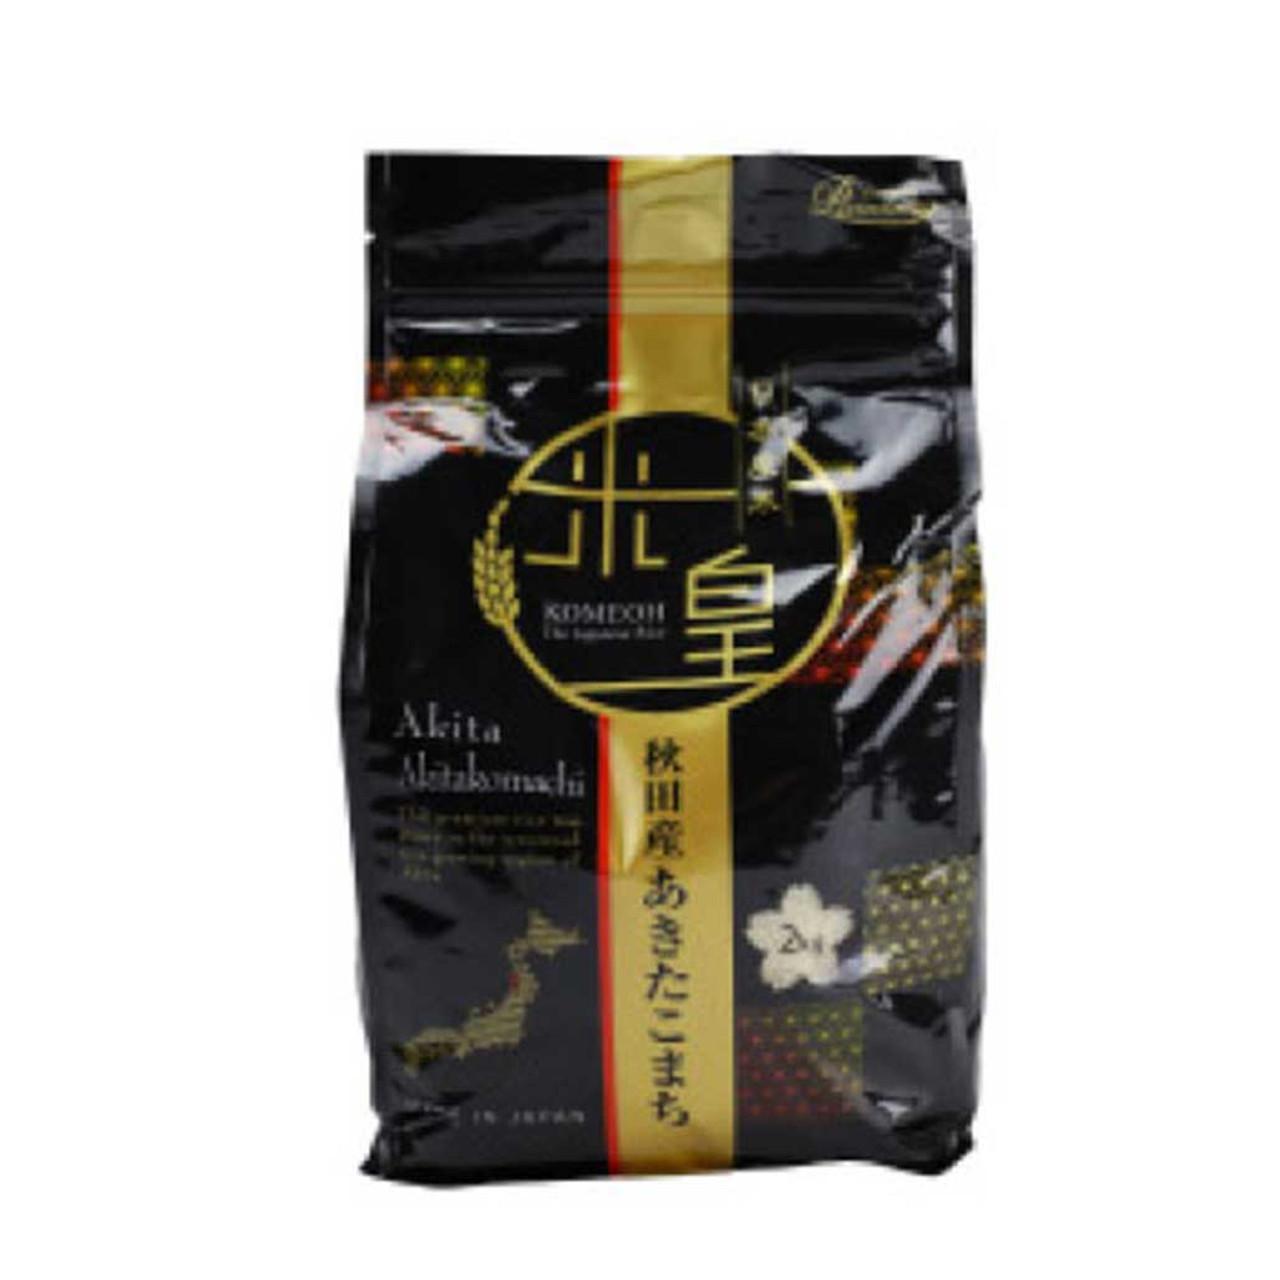 Komeoh Akita Komachi Short Grain White Rice